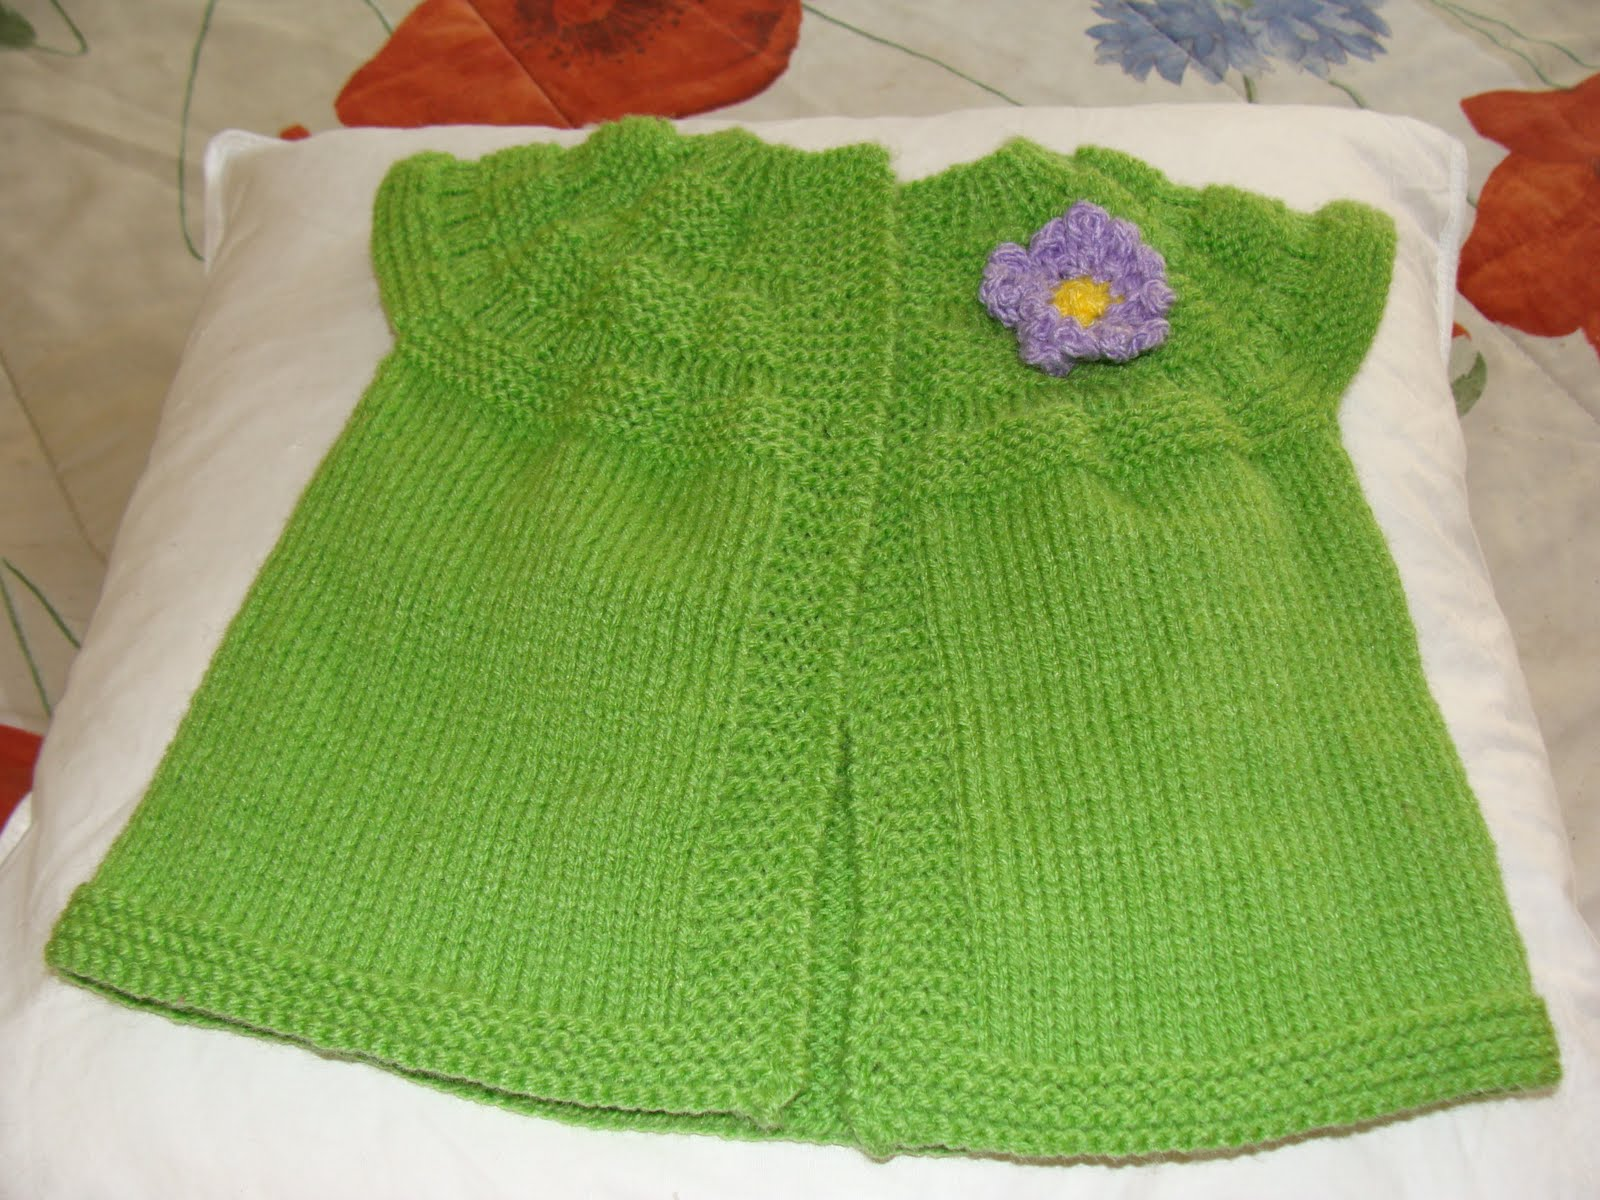 Chaleco (saquito) para bebe 6-12 meses tejido en lana a palillos con